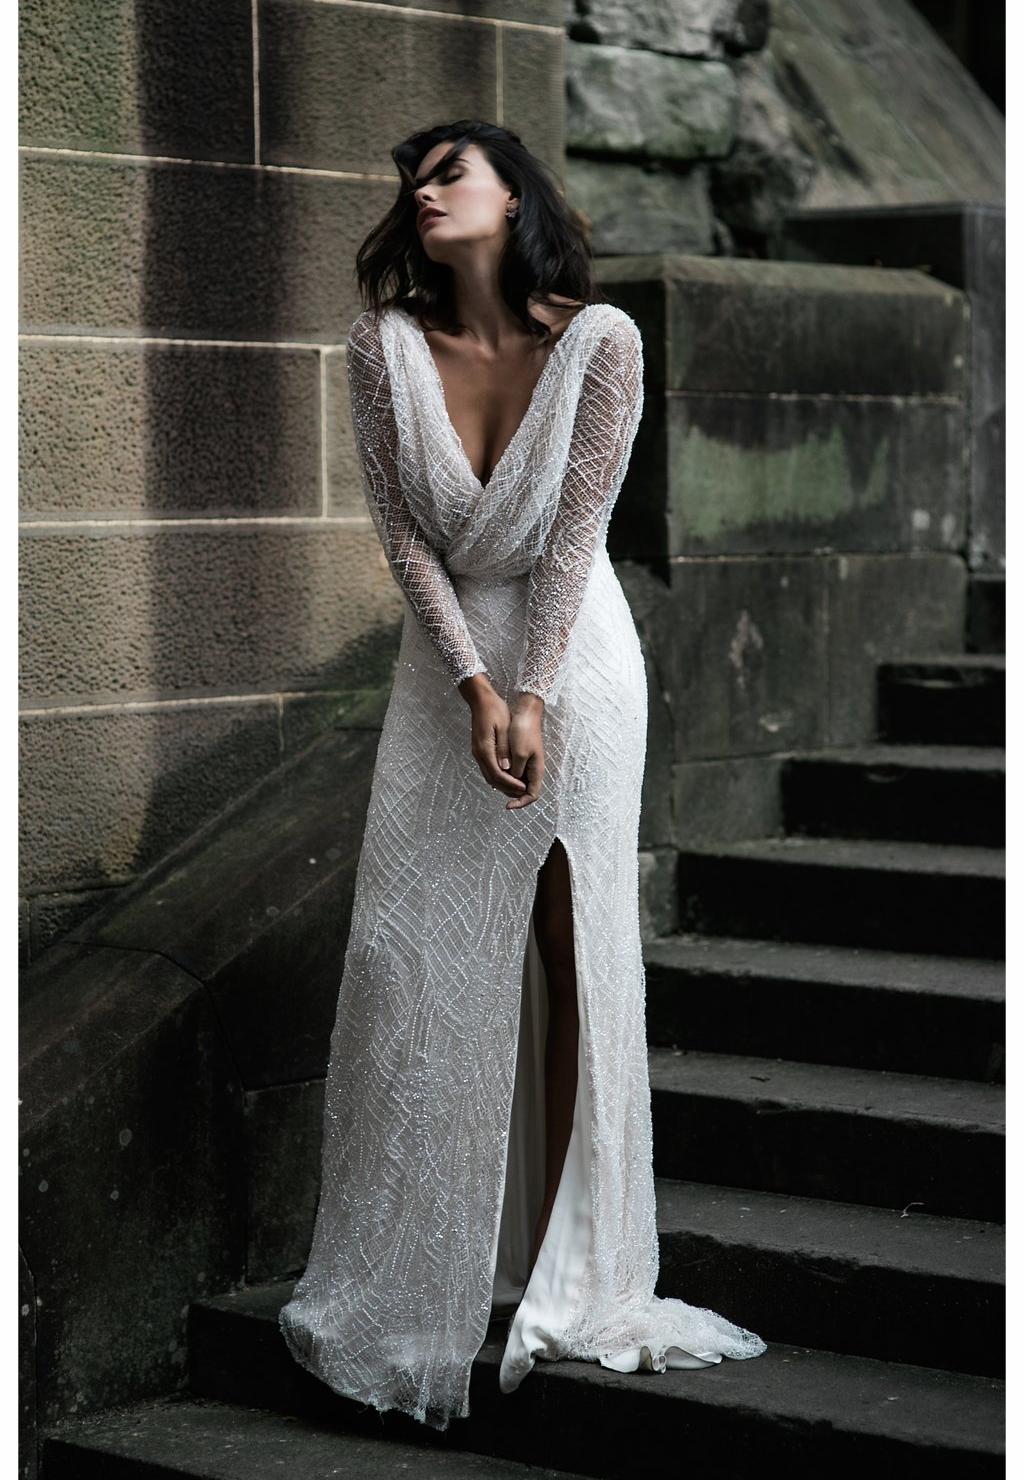 moira hughes v neck wedding dresses sydney.jpg